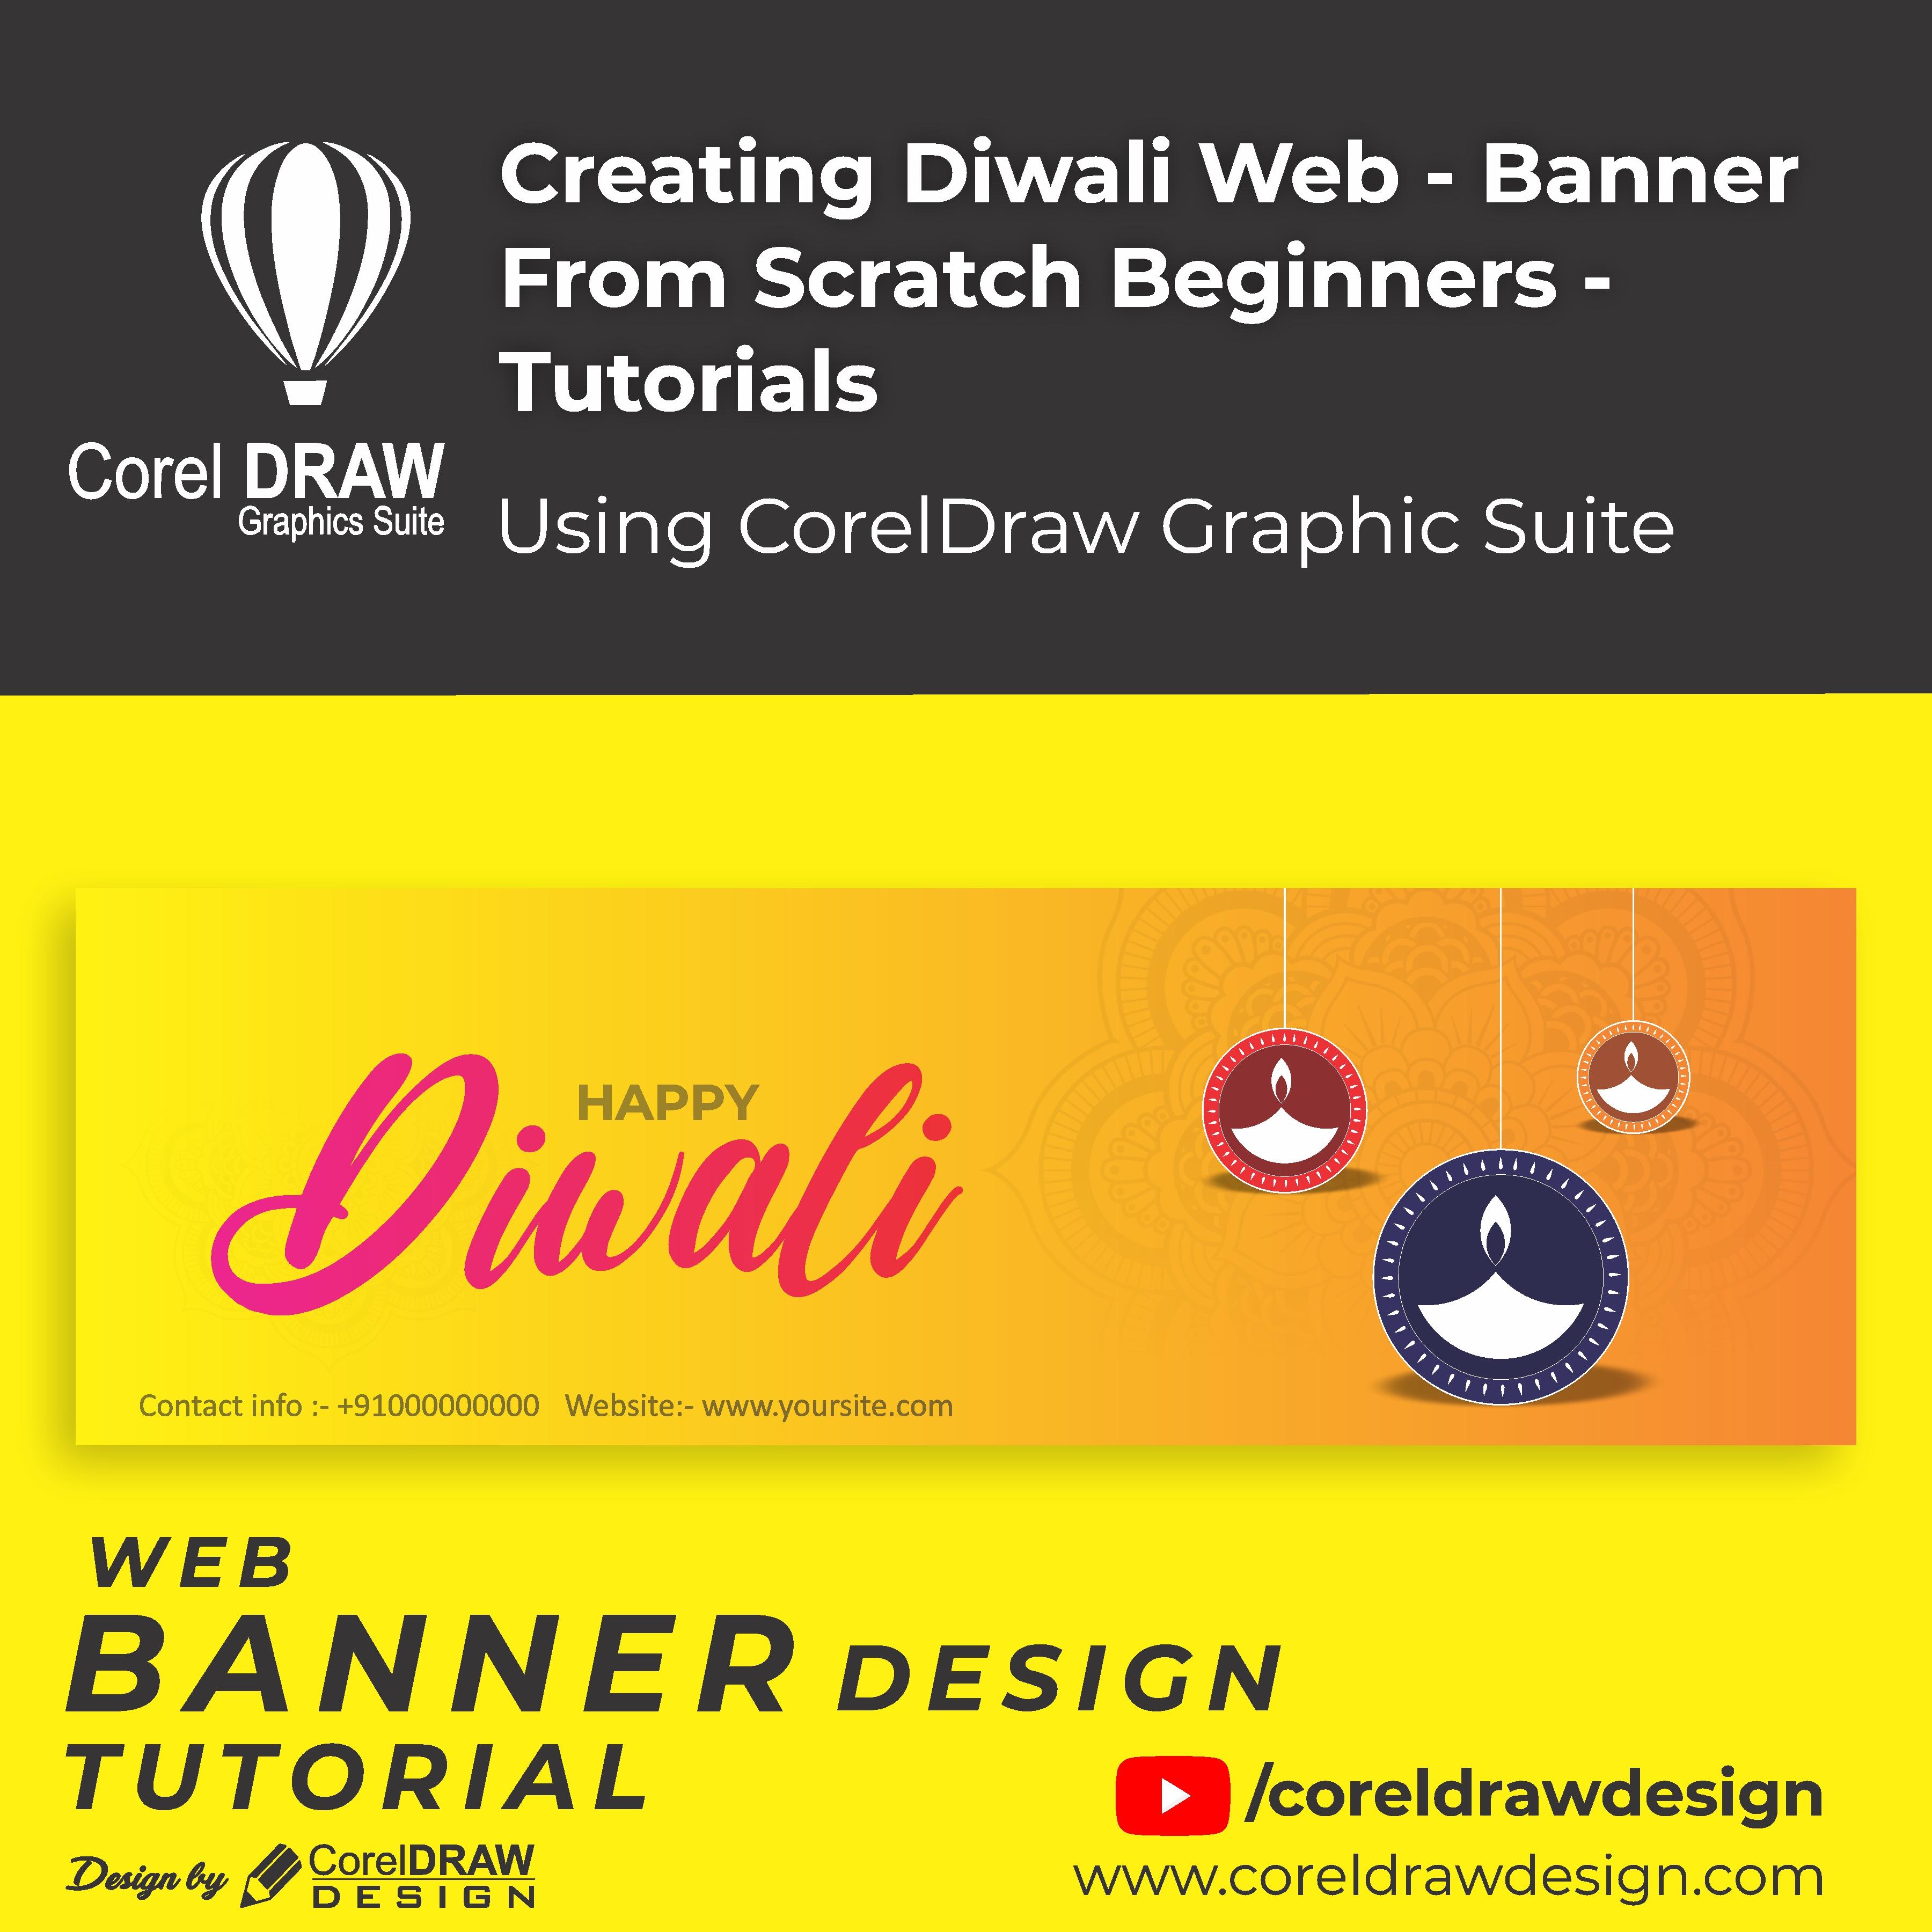 Creating - Creative Diwali web banner - Digital Graphics - Tutorial - Coreldraw for Beginners